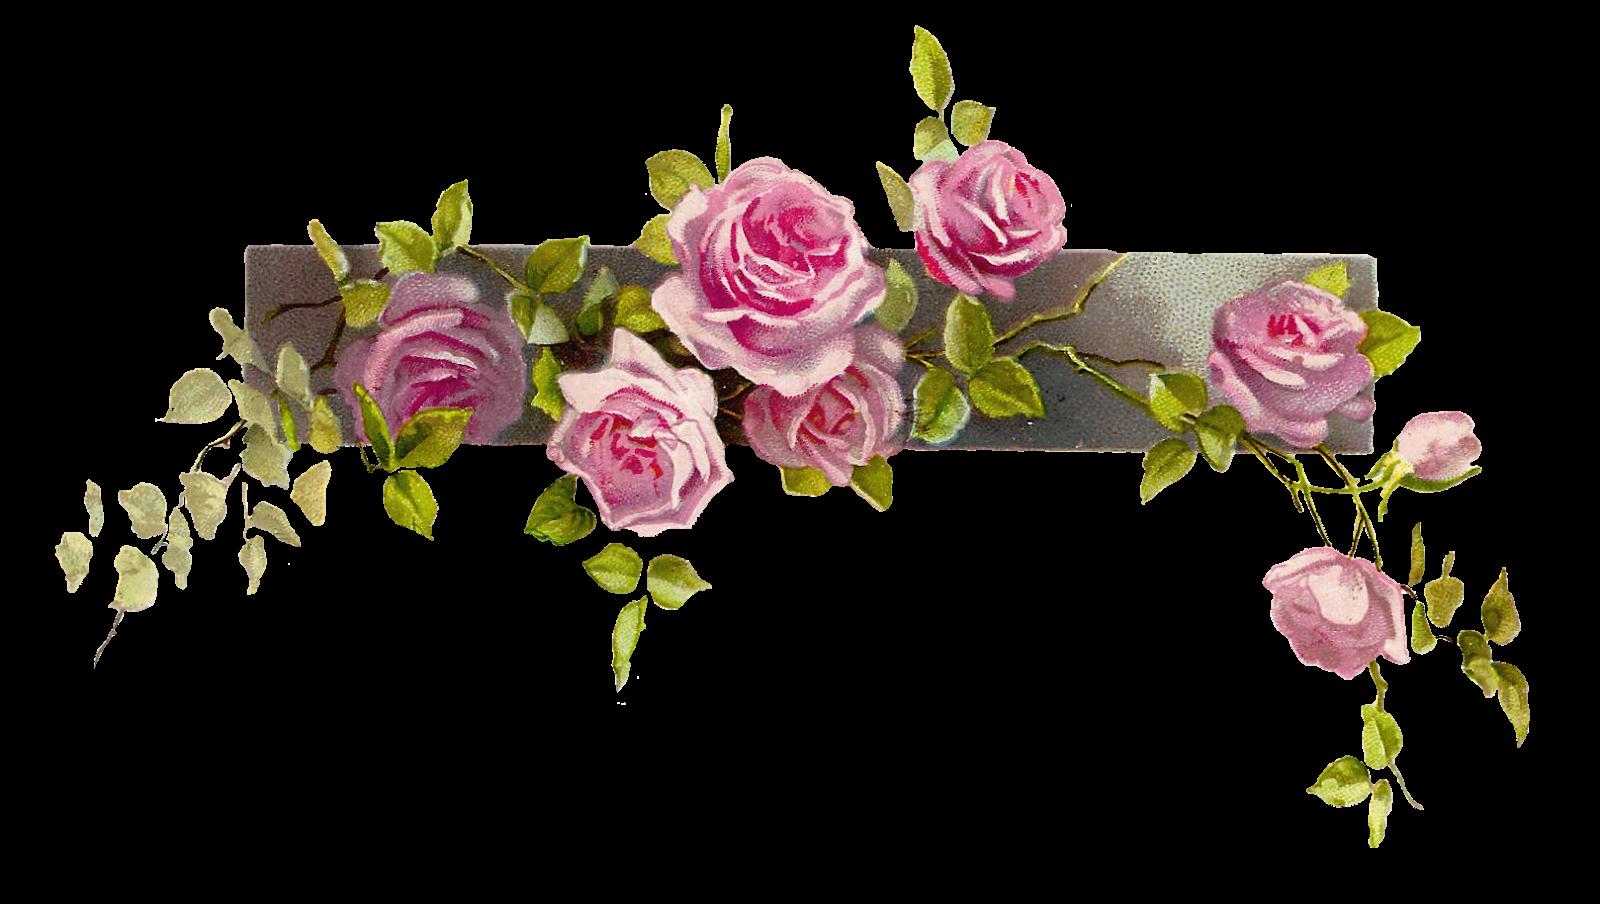 Flower border flower clip art free free flower graphic vintage.